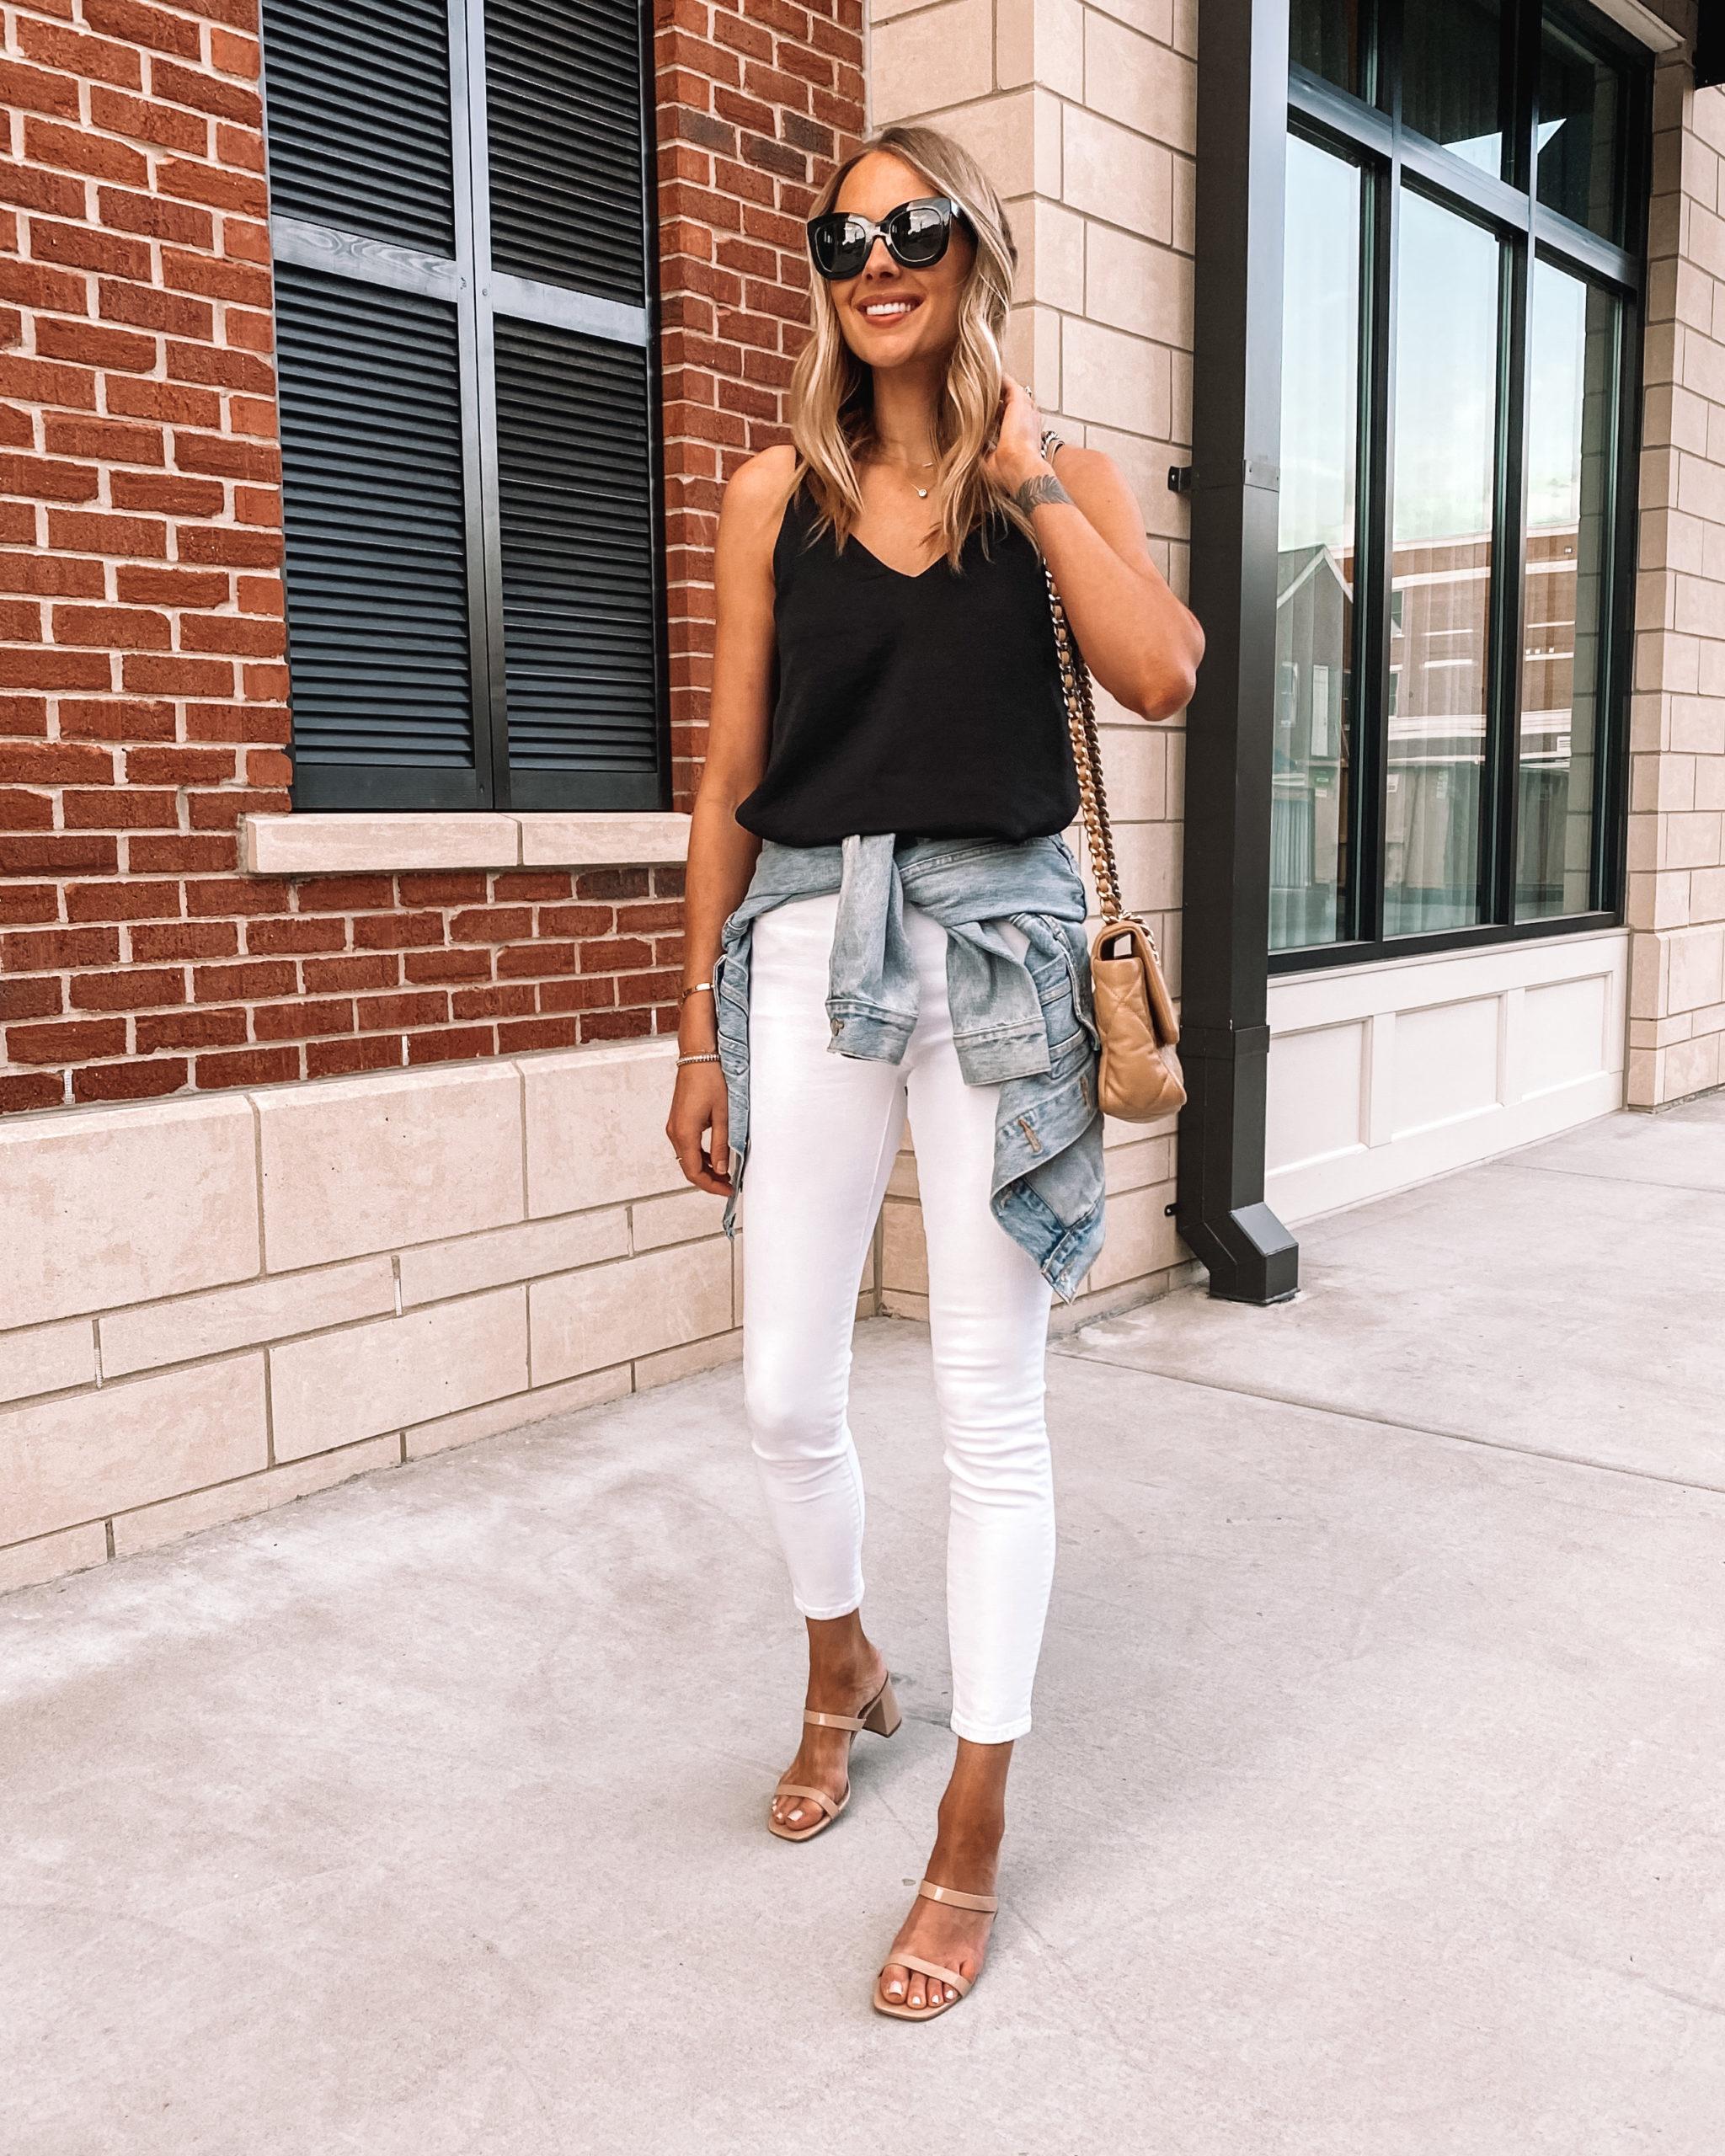 Fashion Jackson Wearing Black Cami Everlane White Skinny Jeans Denim Jacket Beige Sandals